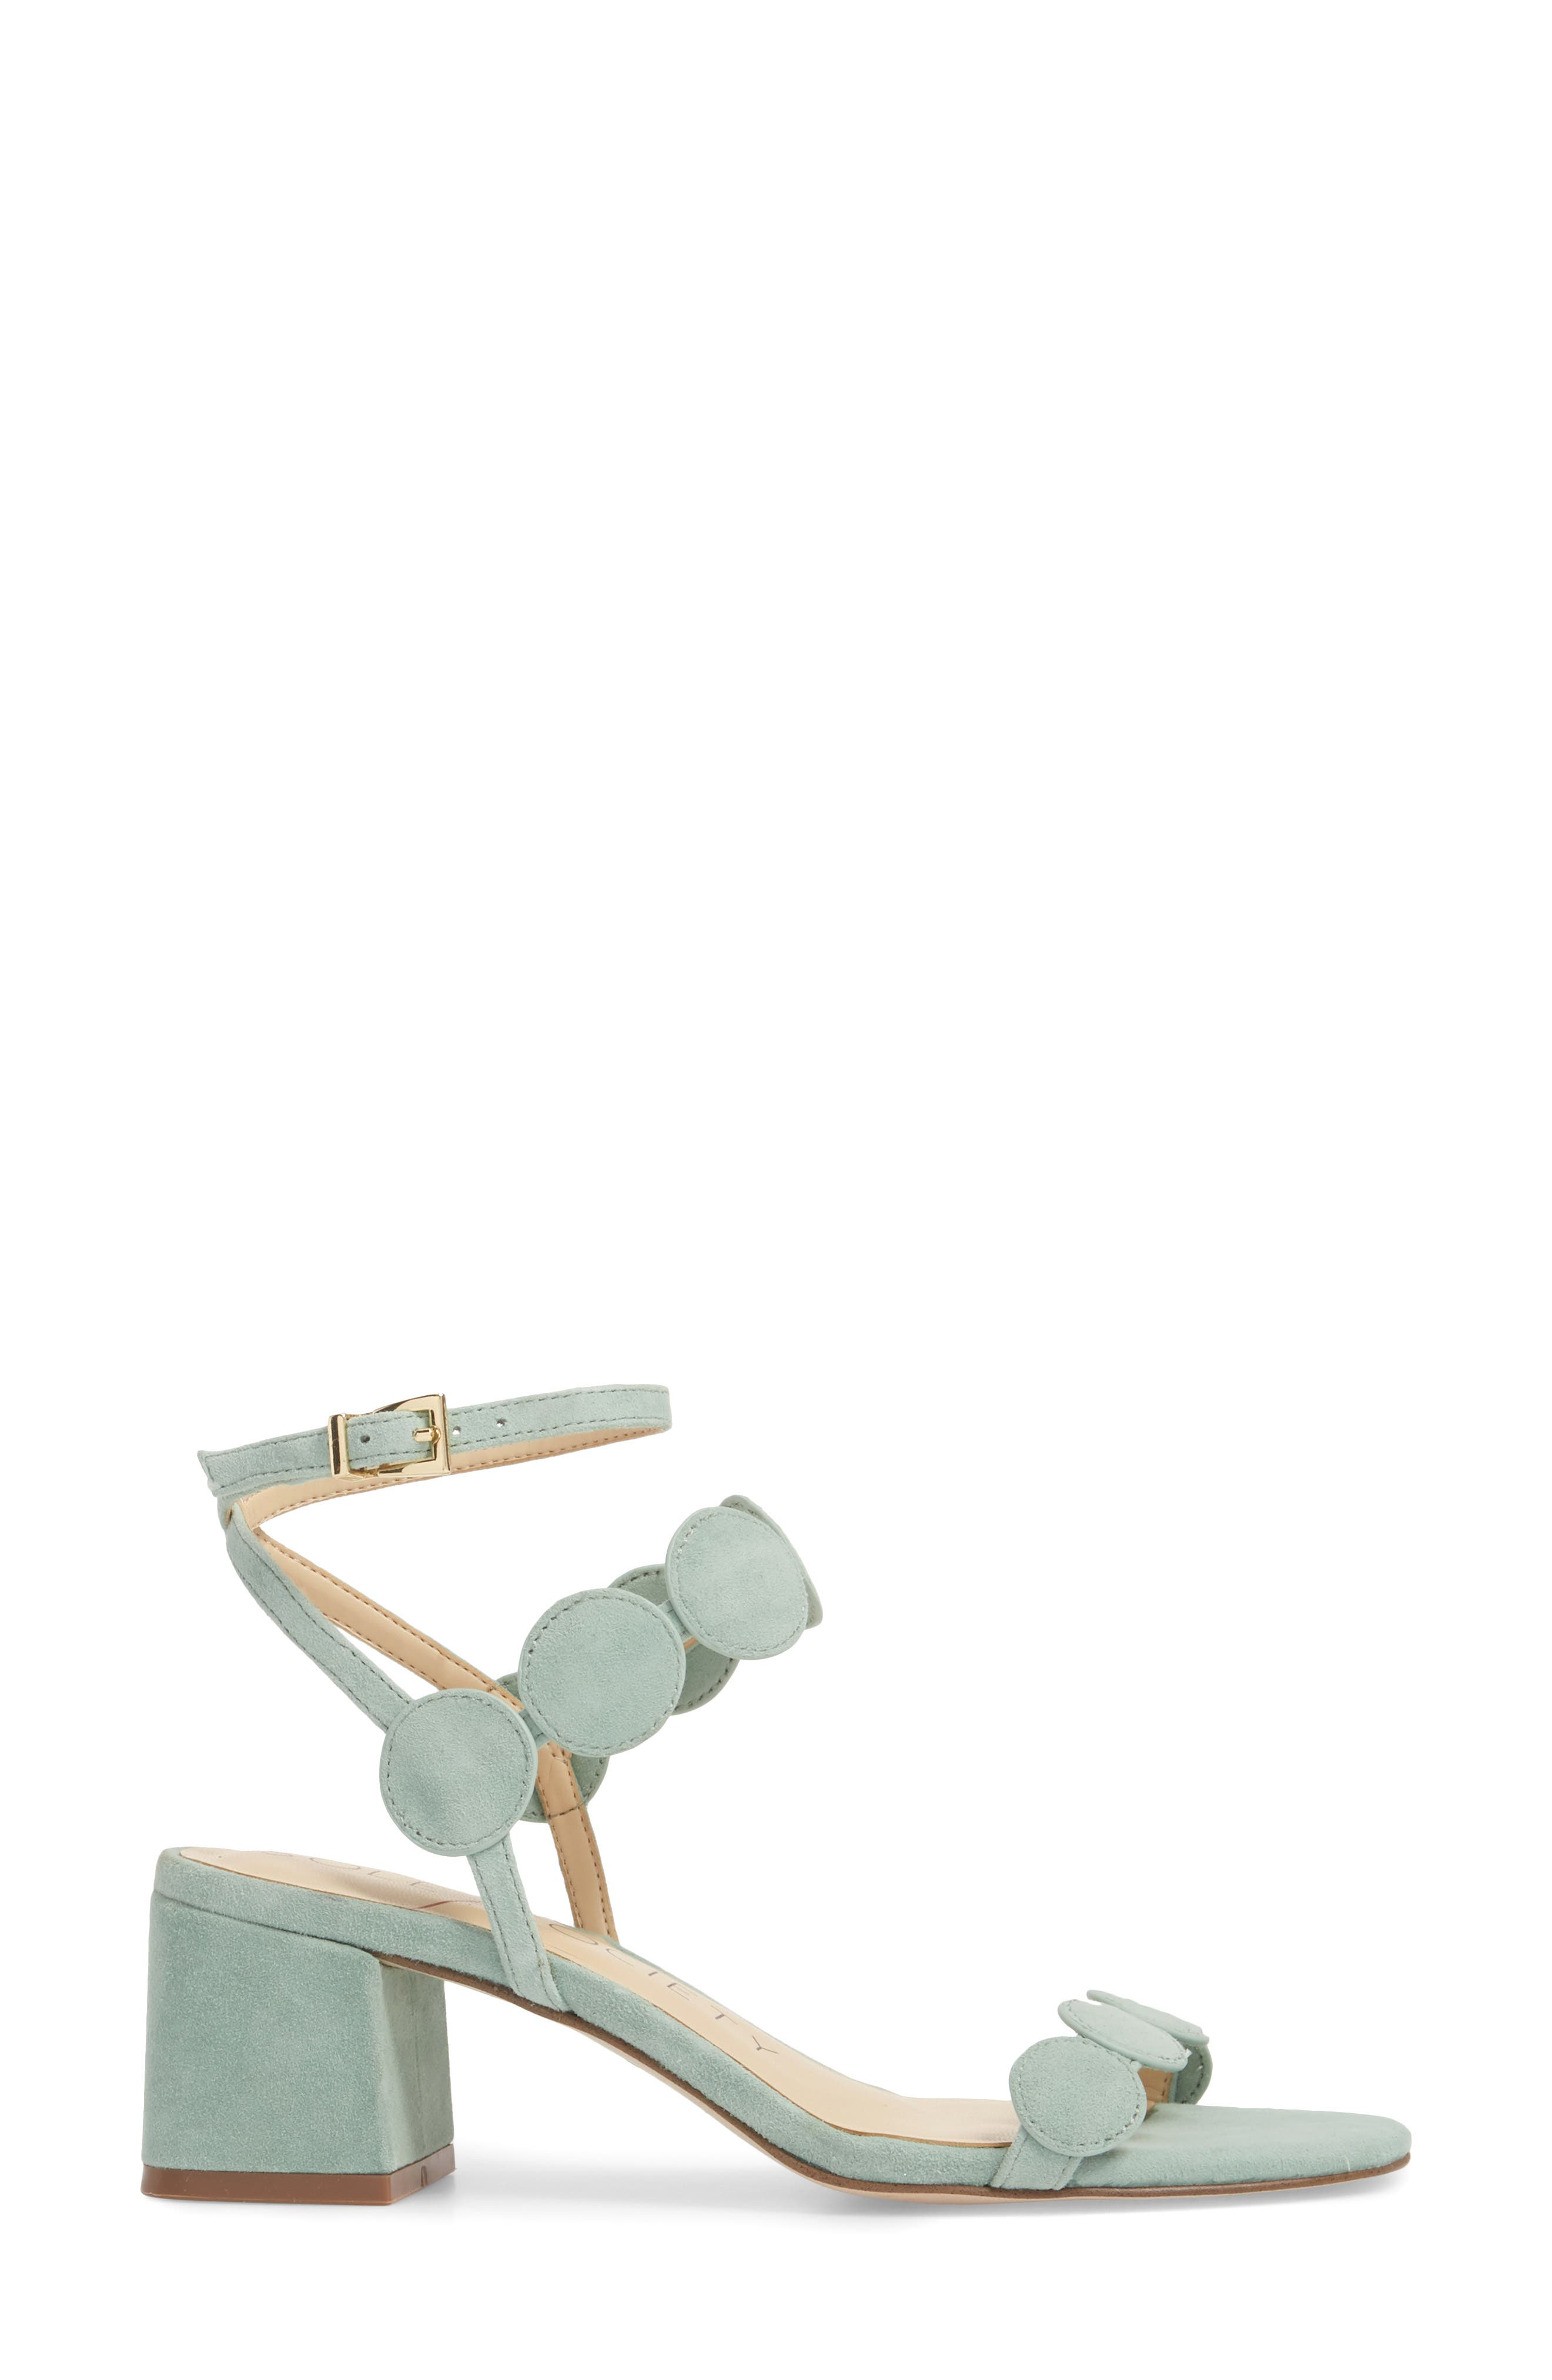 Shea Block Heel Sandal,                             Alternate thumbnail 3, color,                             Sage Green Suede